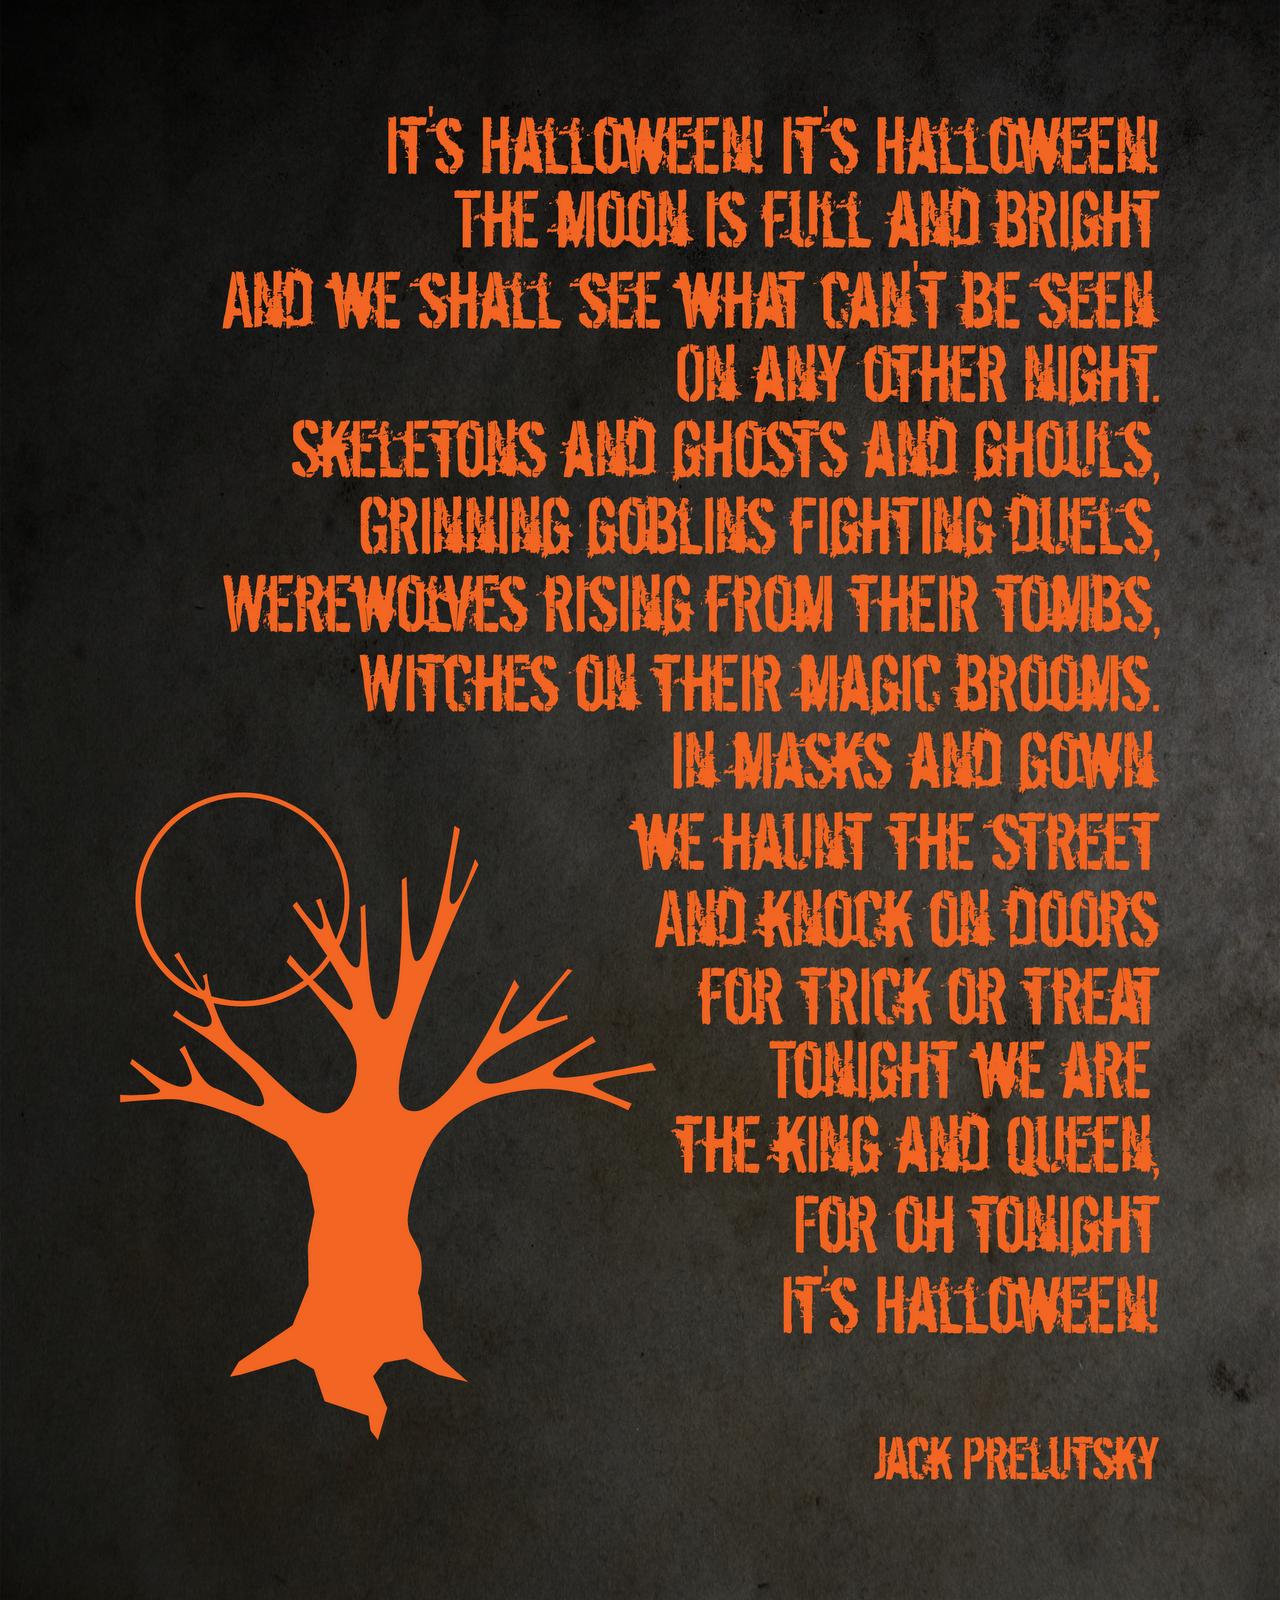 It's Halloween - Jack Prelutsky | Halloween Limericks | Pinterest ...